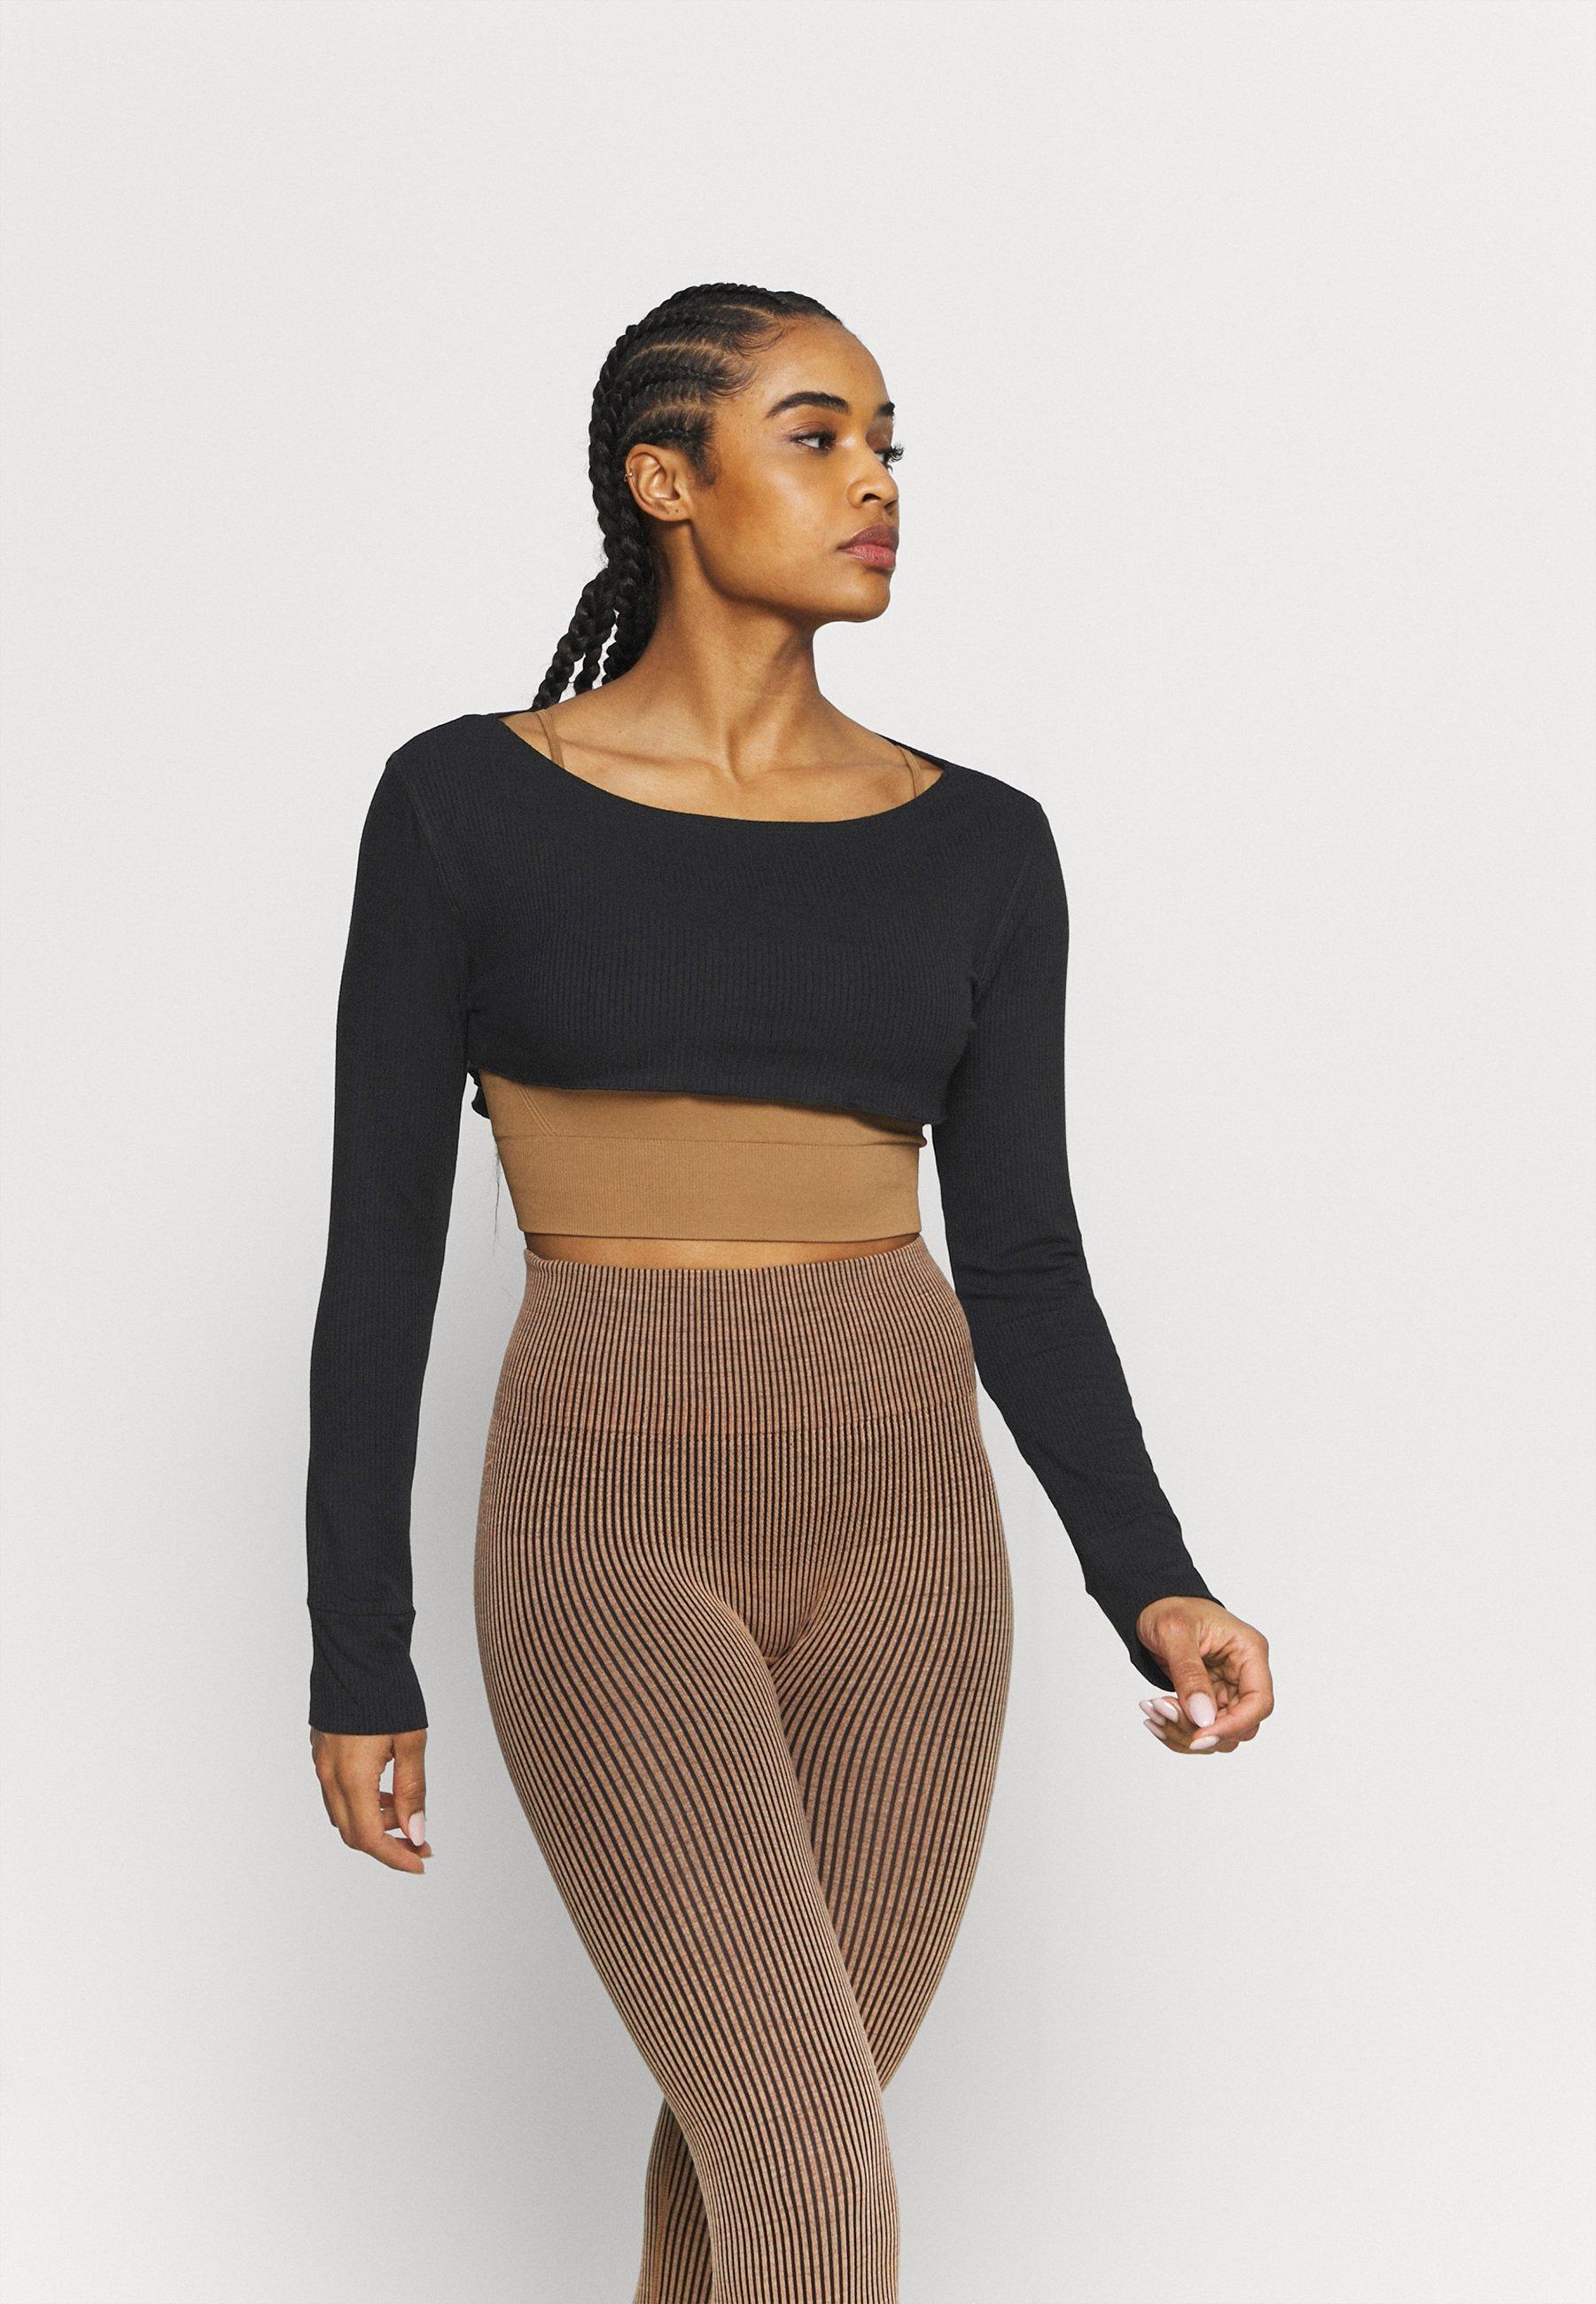 Women KEEP IT STEADY SHRUG - Long sleeved top